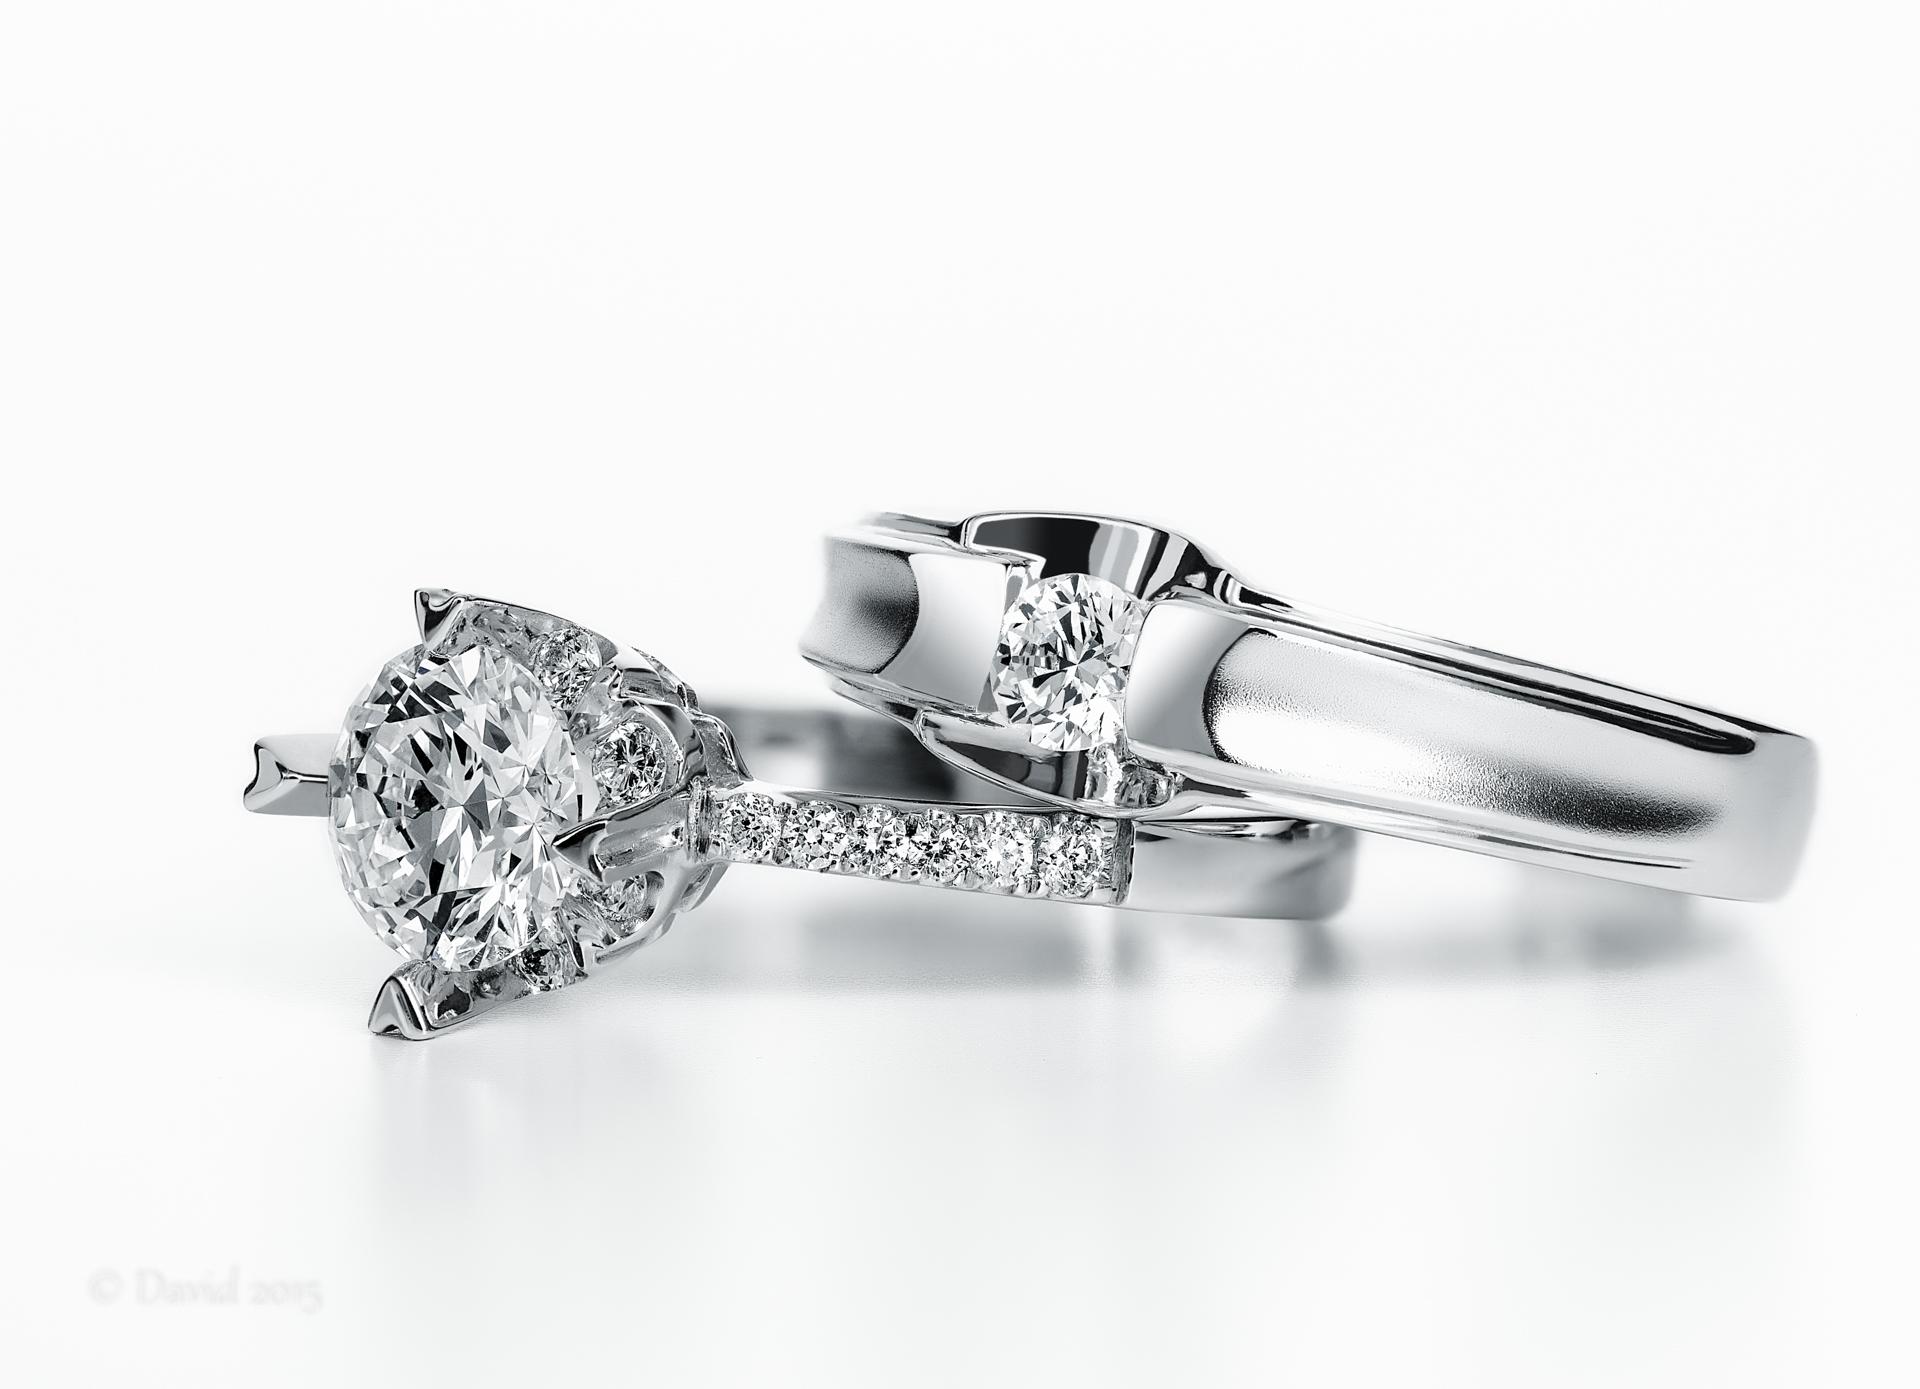 Diamonds_2015-04-04_12-34.jpg